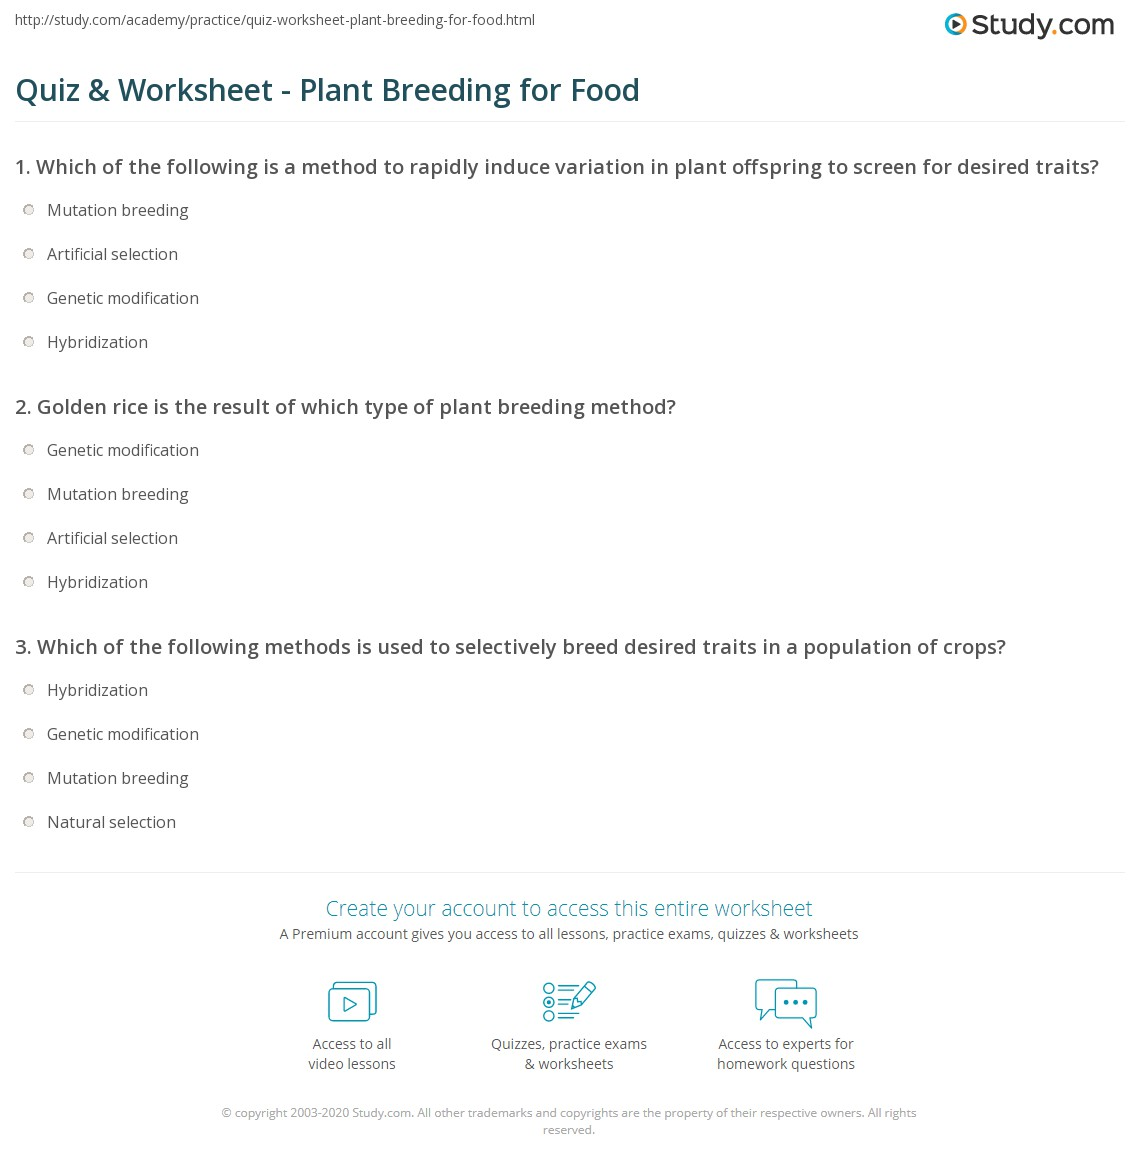 selective breeding worksheet Termolak – Evolution by Natural Selection Worksheet